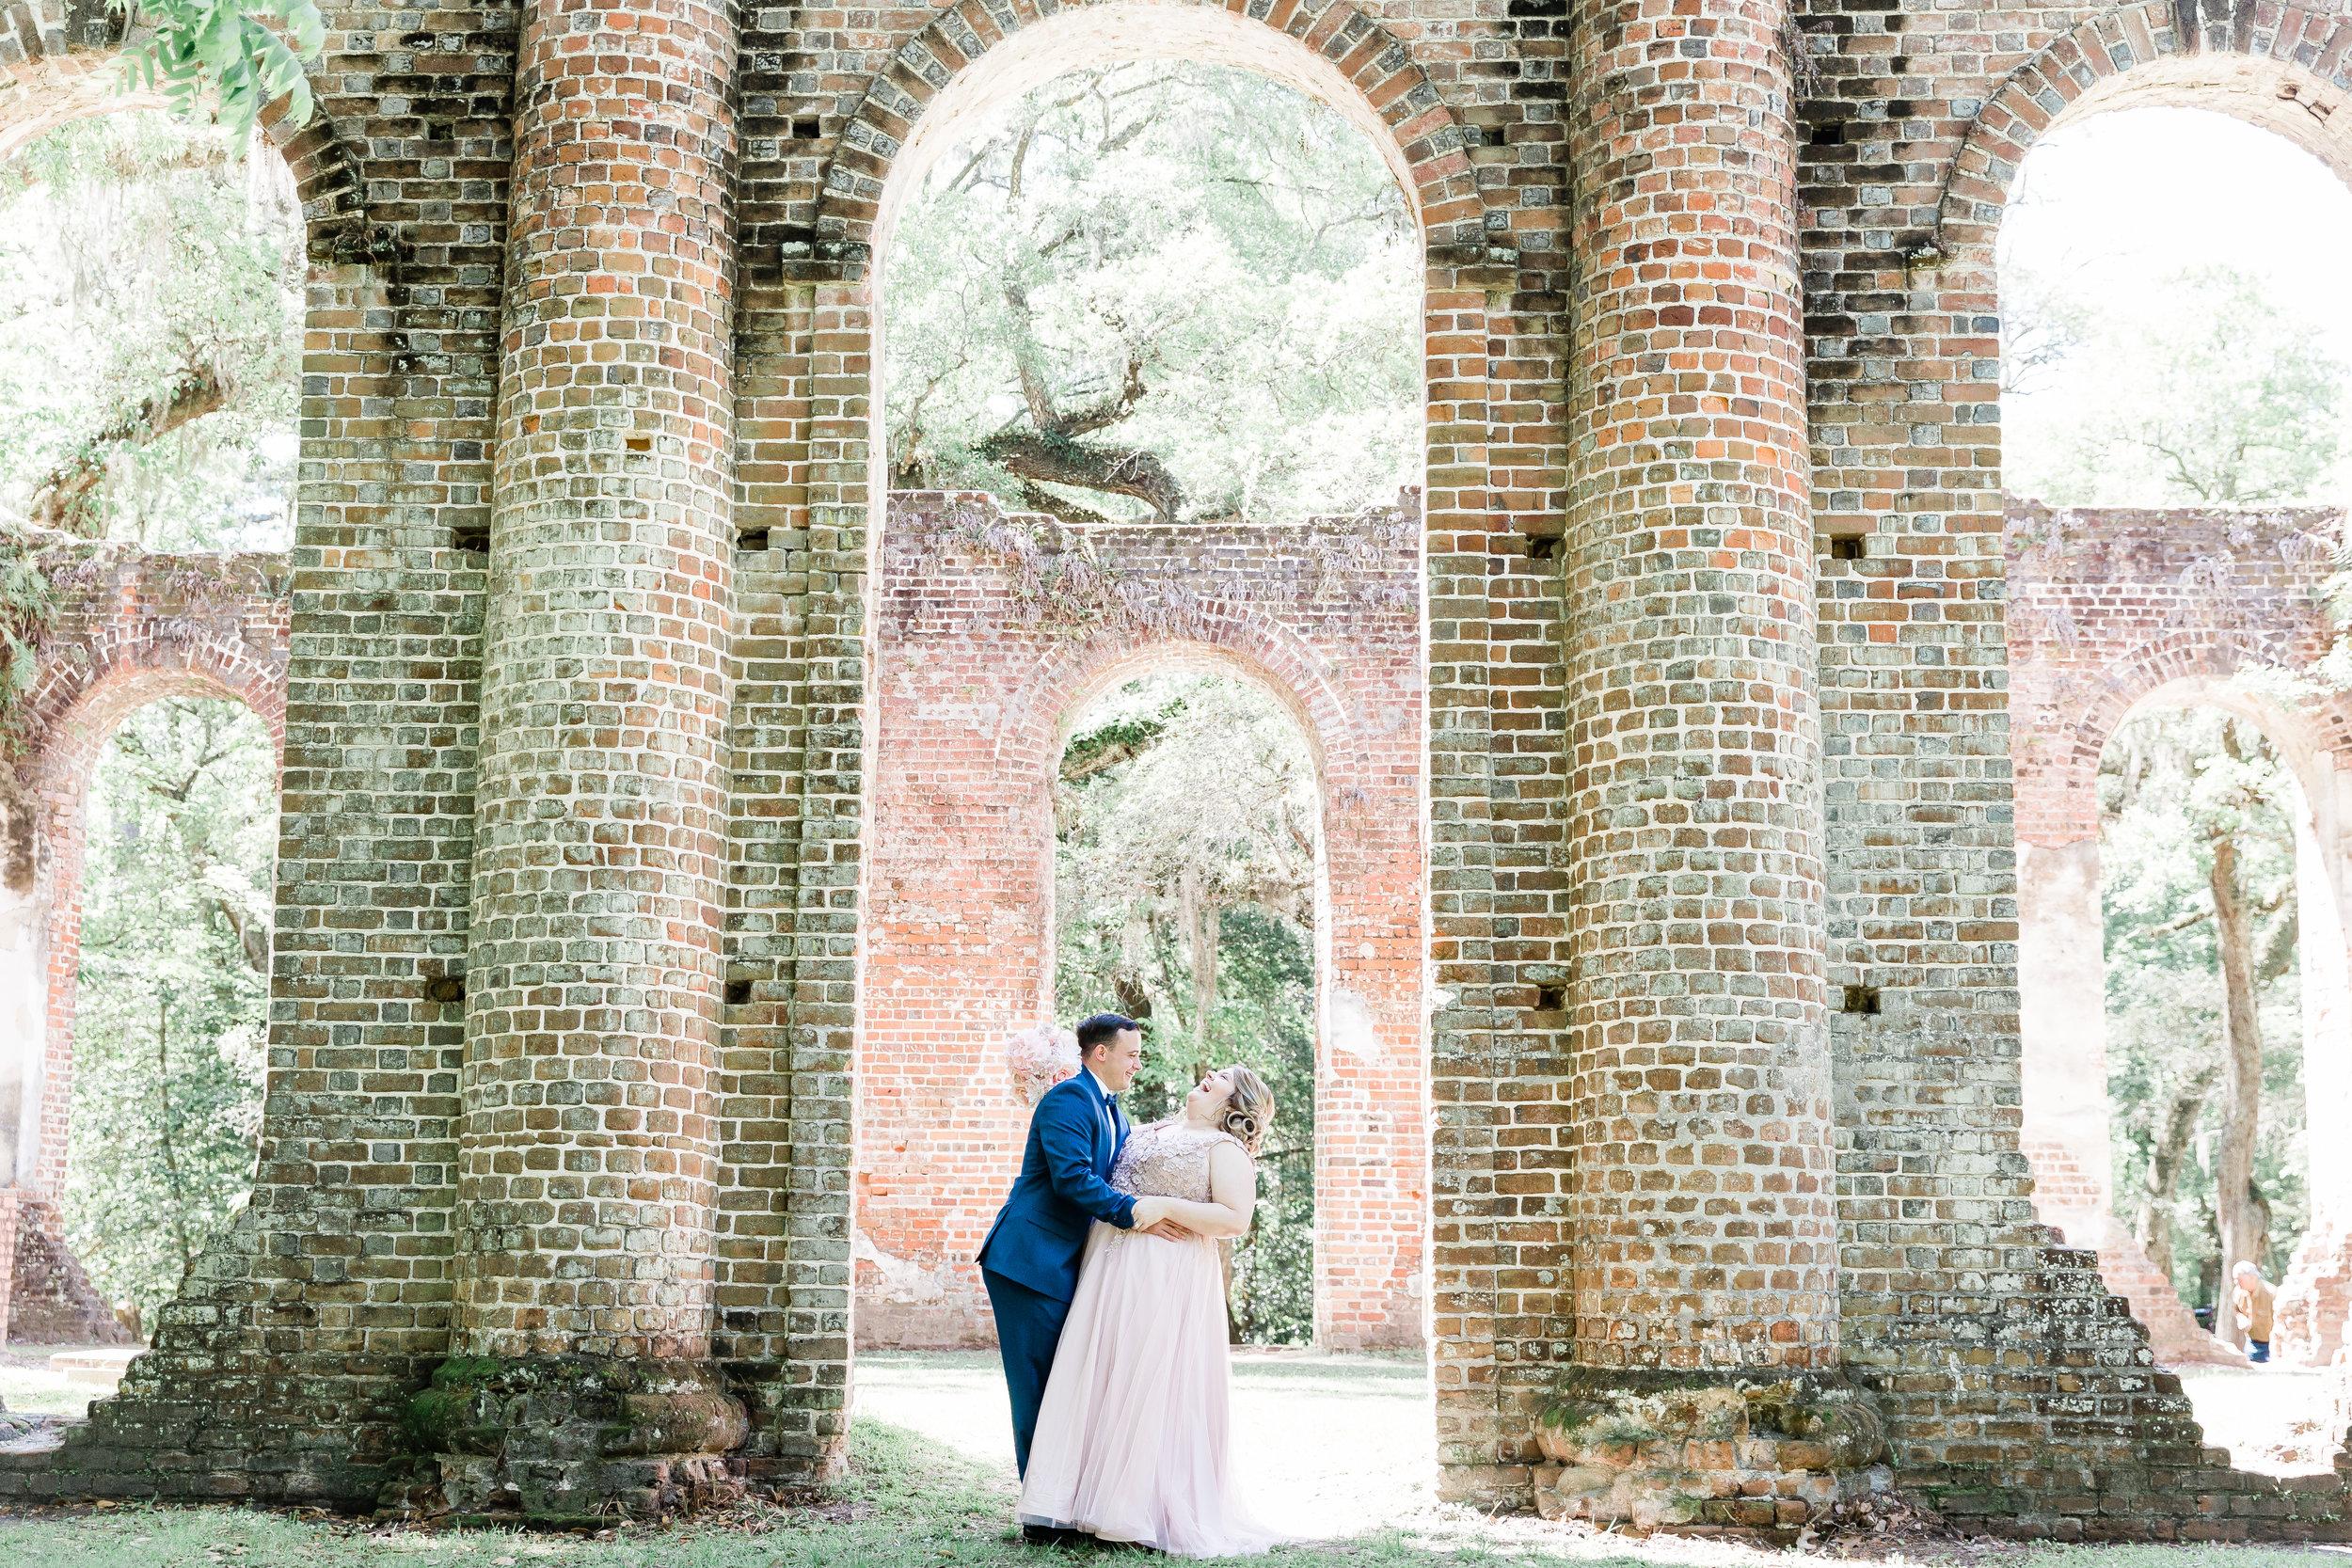 20190417-Southern Lens Photography-savannah family photographer- Ashley and Zack-old sheldon church ruins-201958.jpg